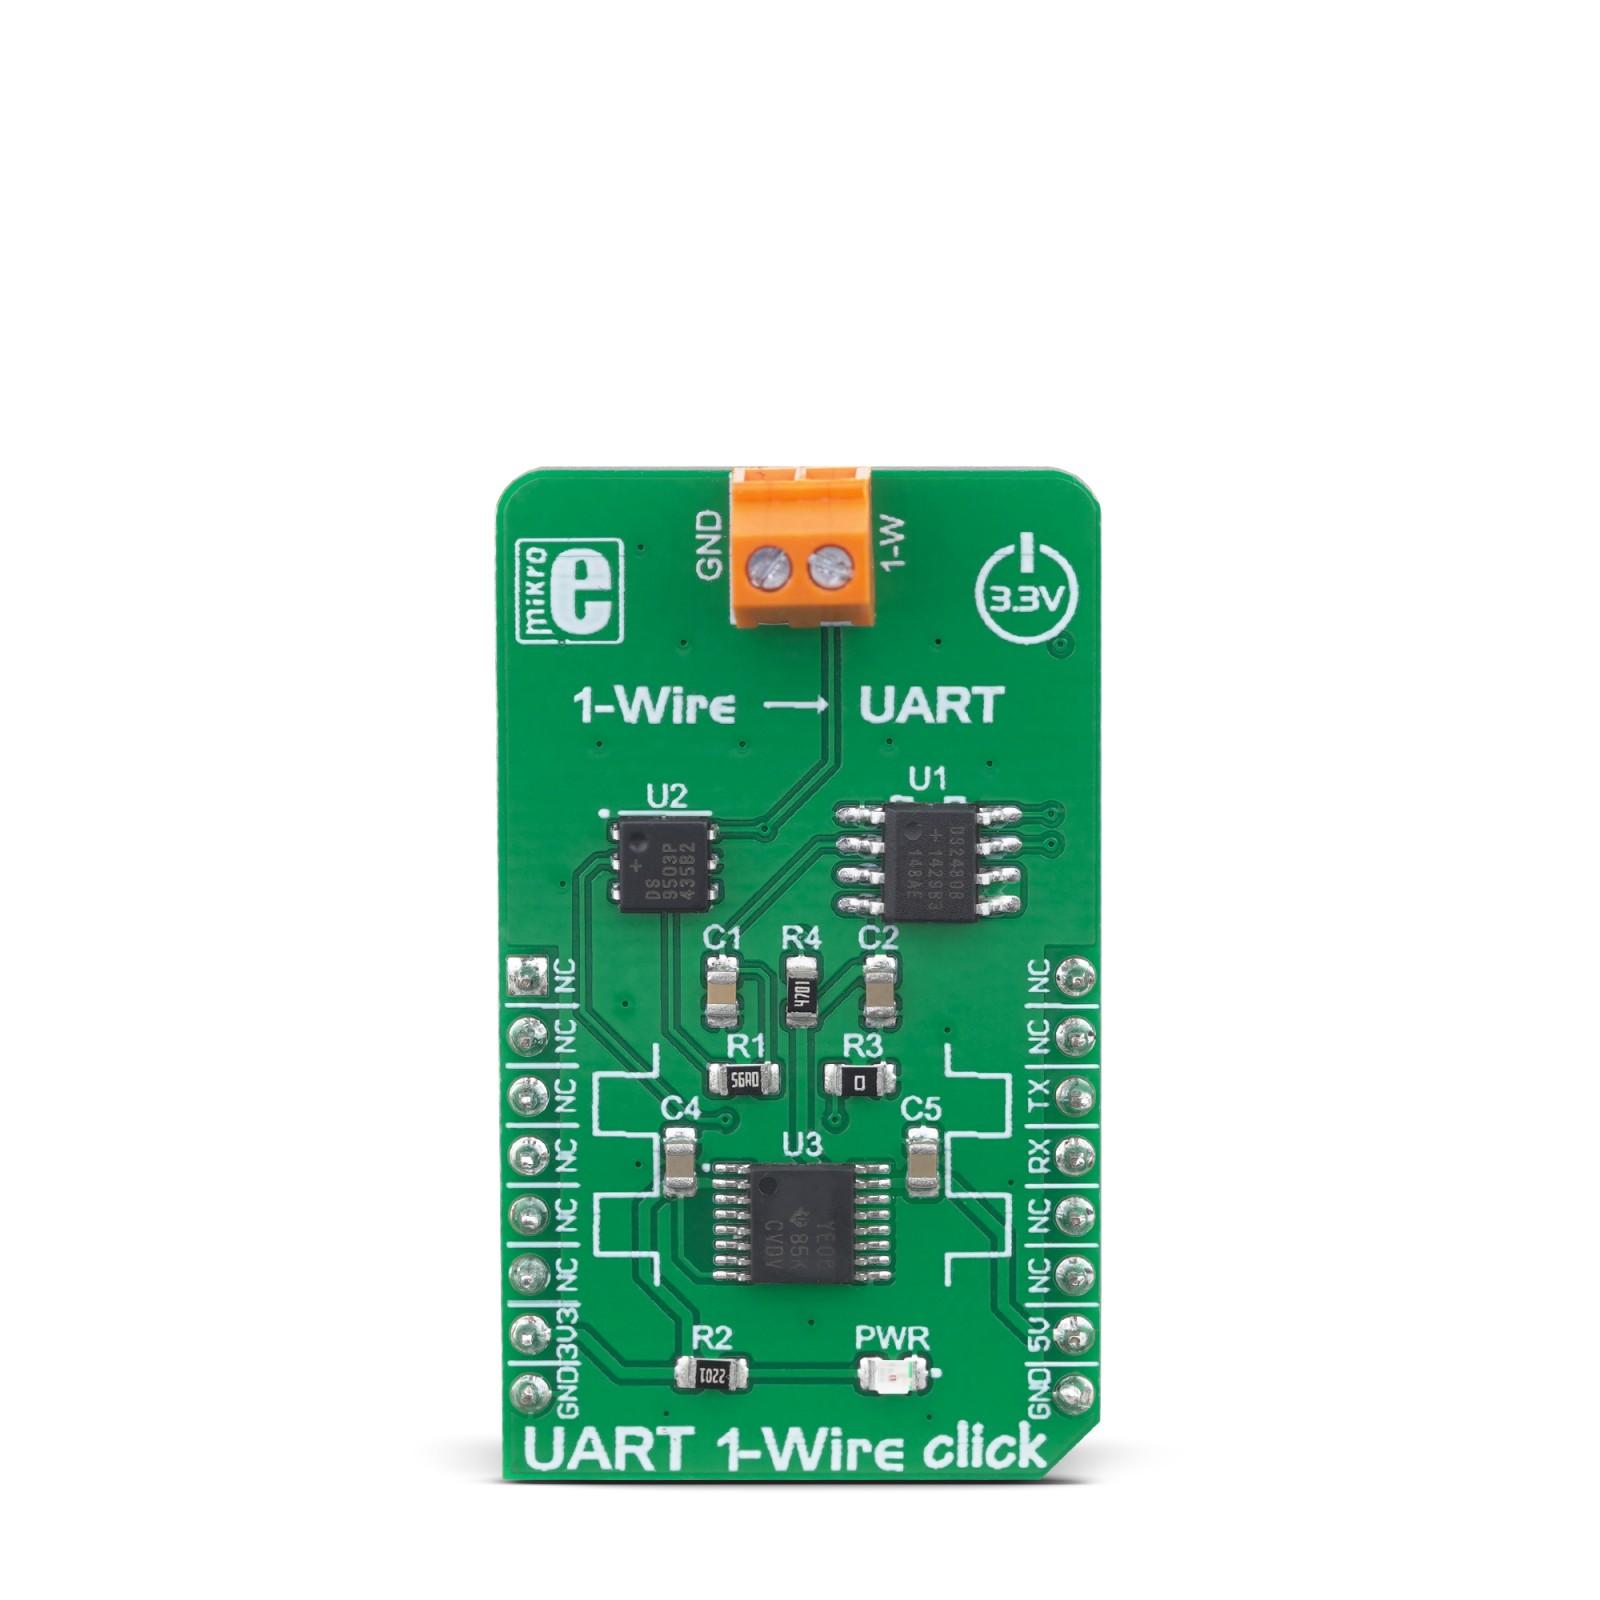 UART 1-Wire Click | MikroElektronika